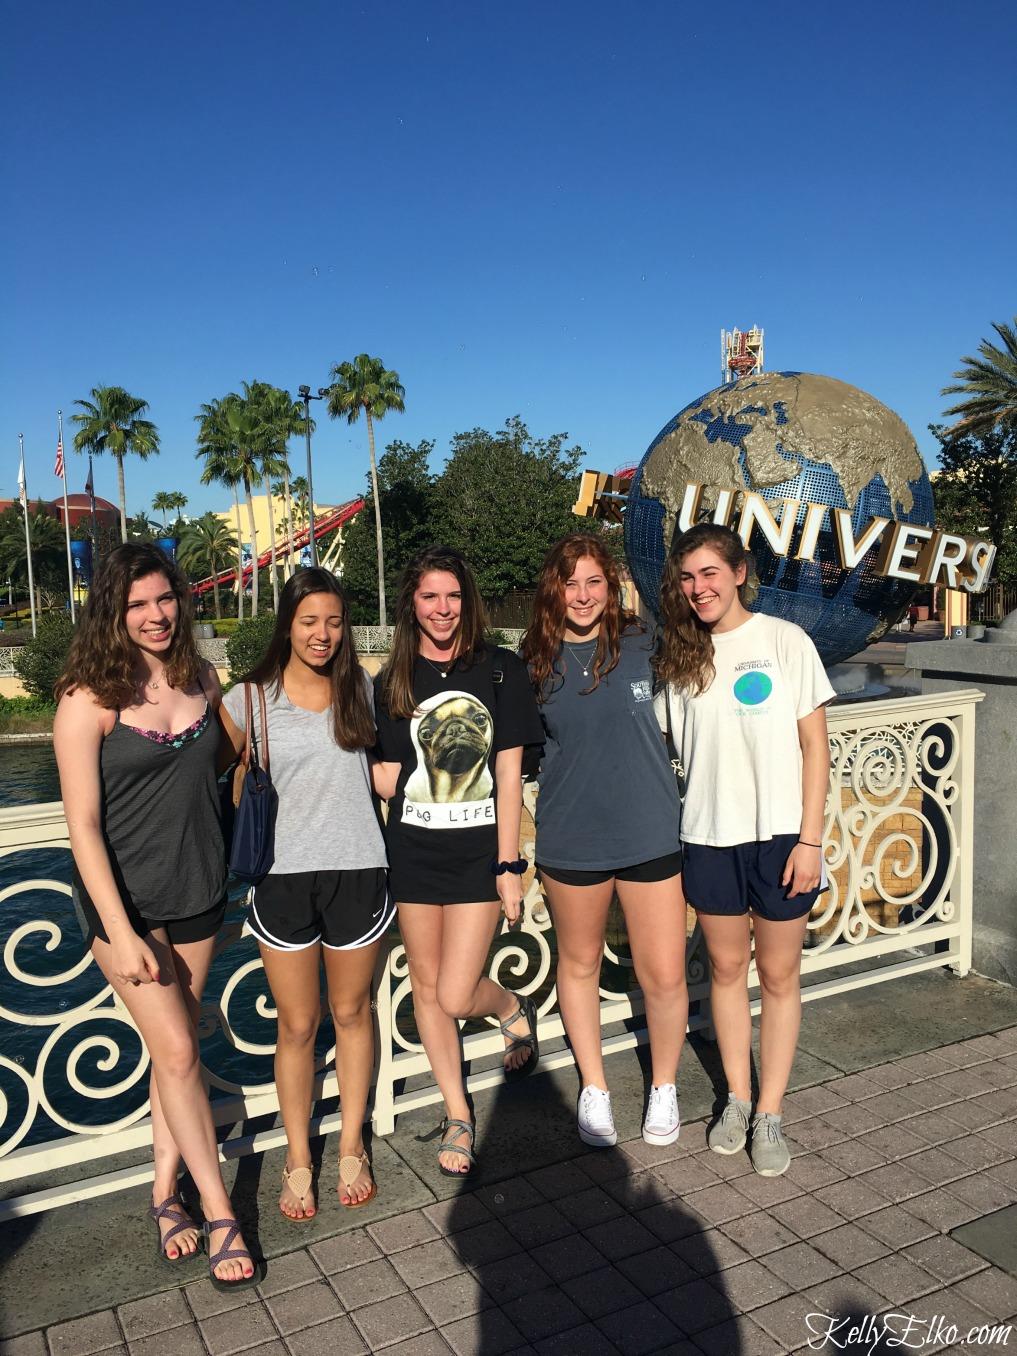 Universal Studios Orlando Florida - fun girls getaway kellyelko.com